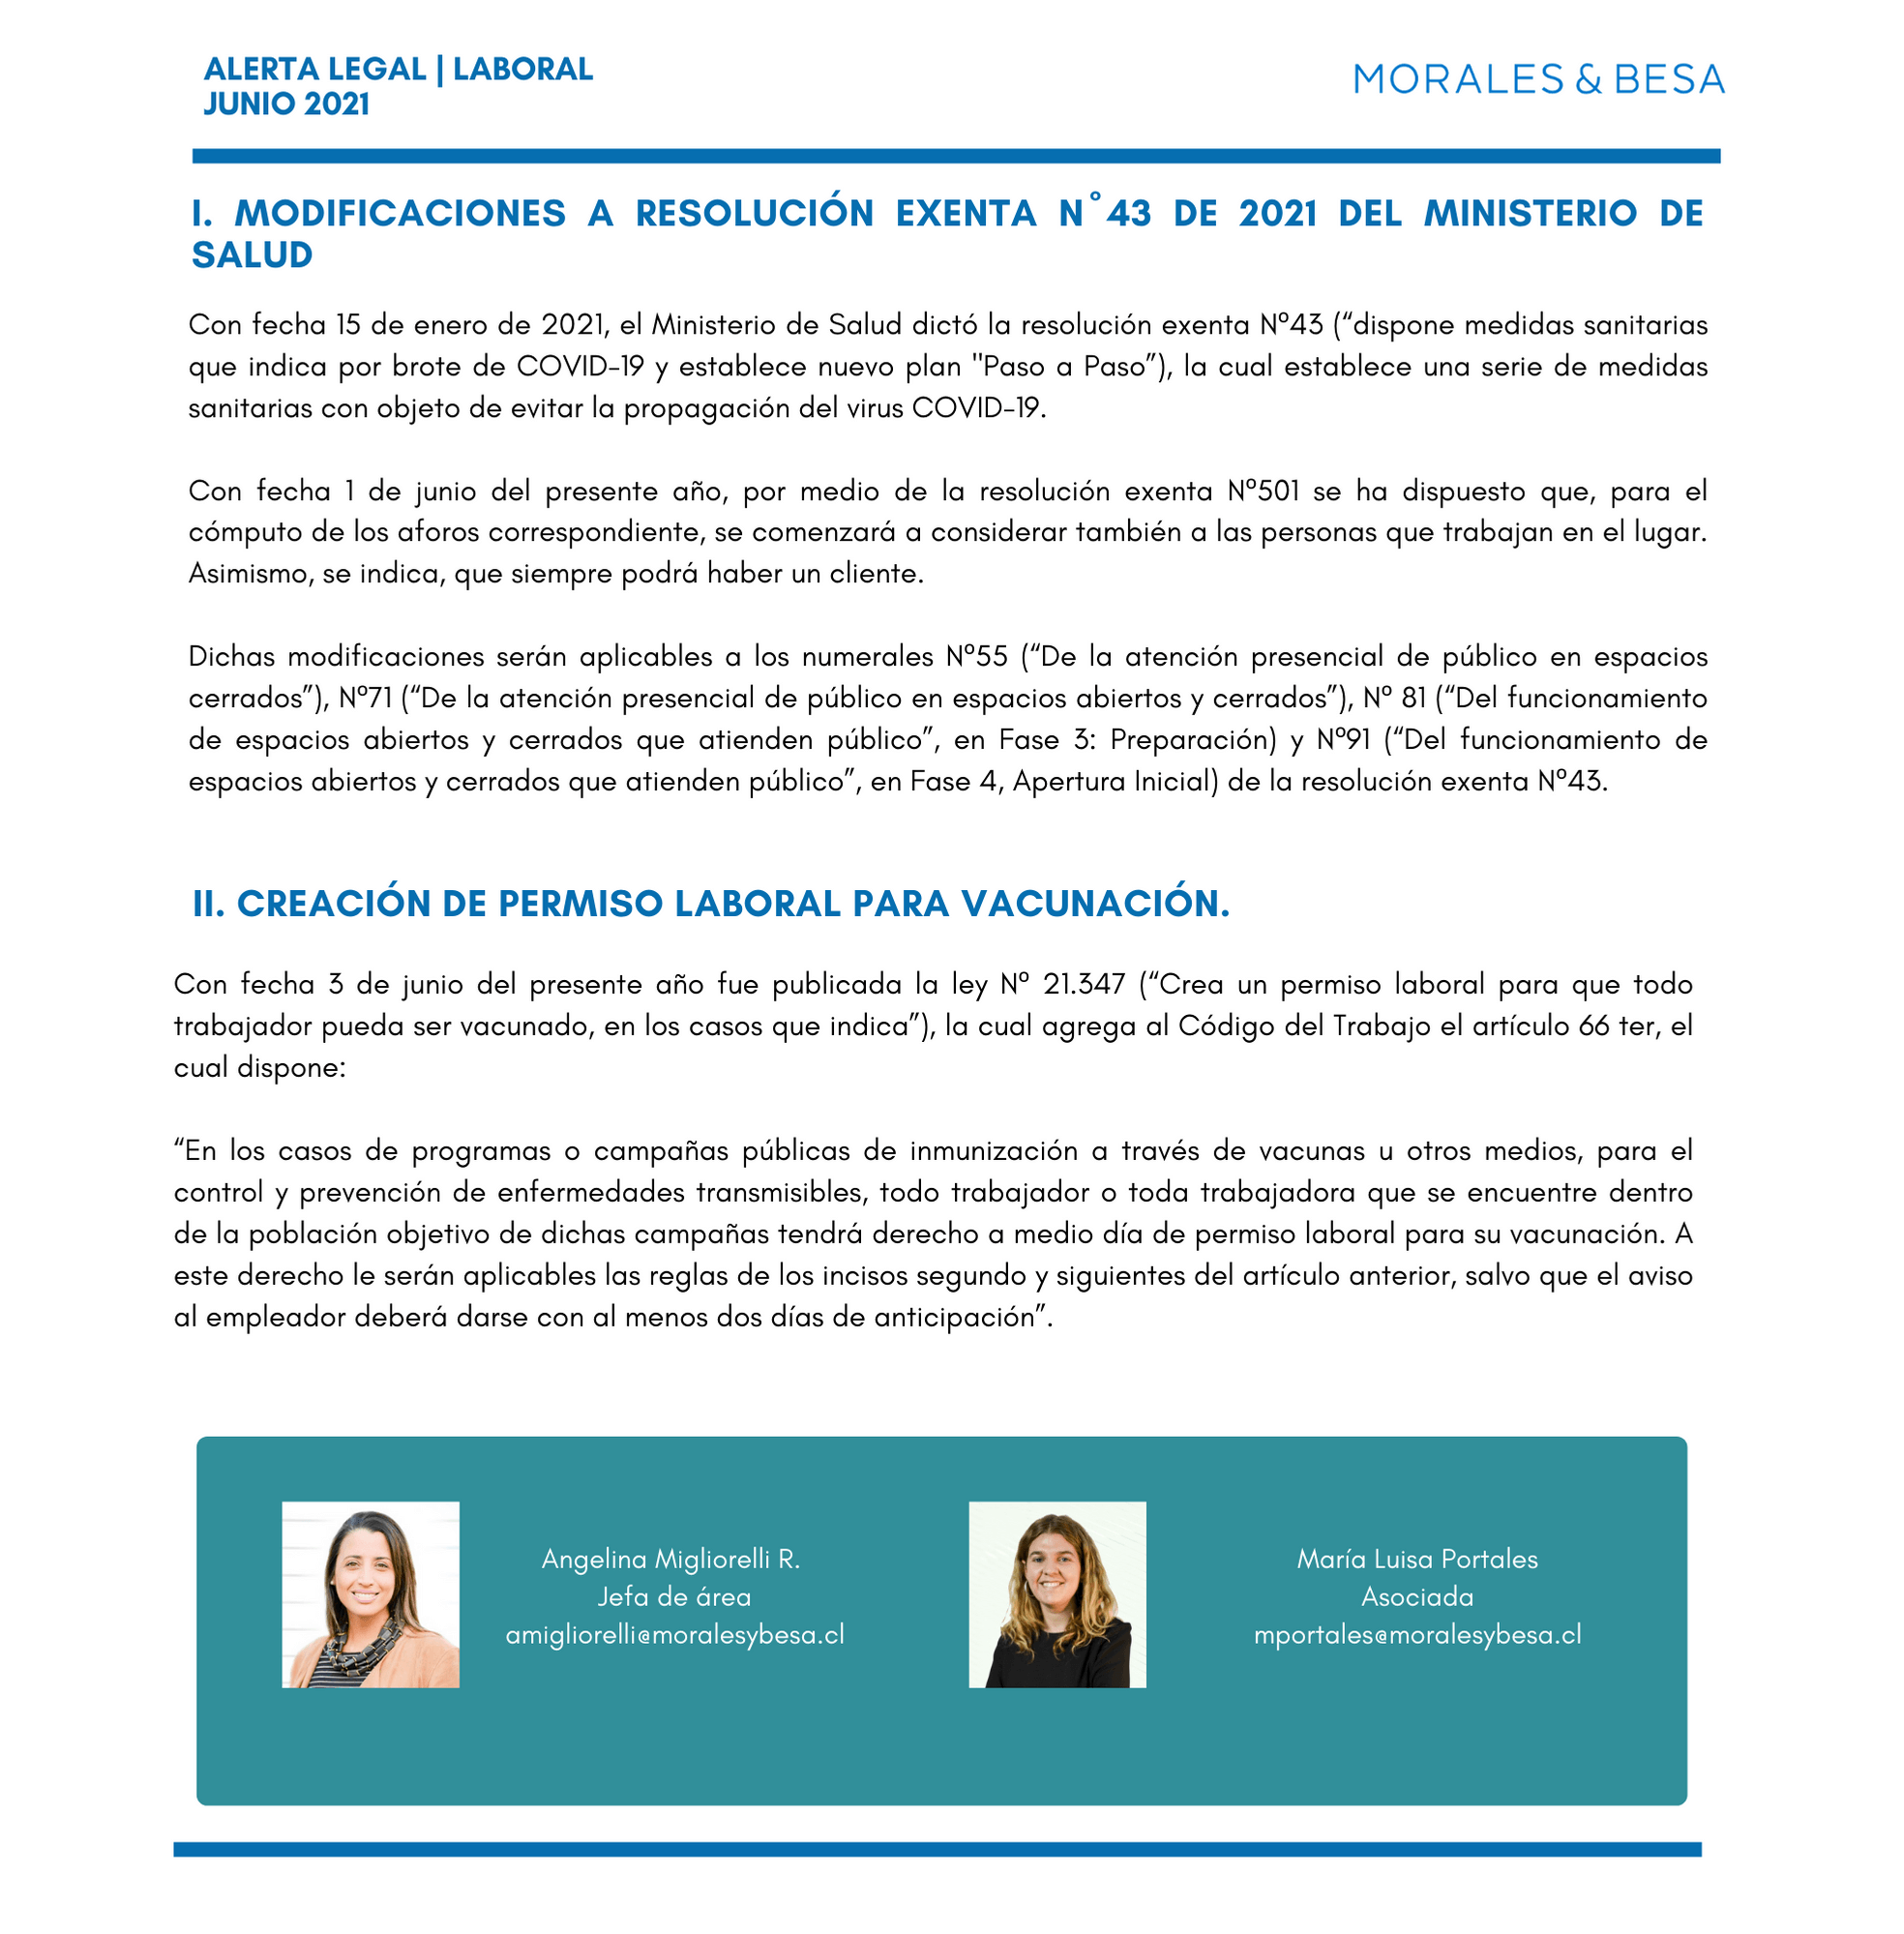 Alerta Legal M&B - Laboral - Junio 2021 (1)